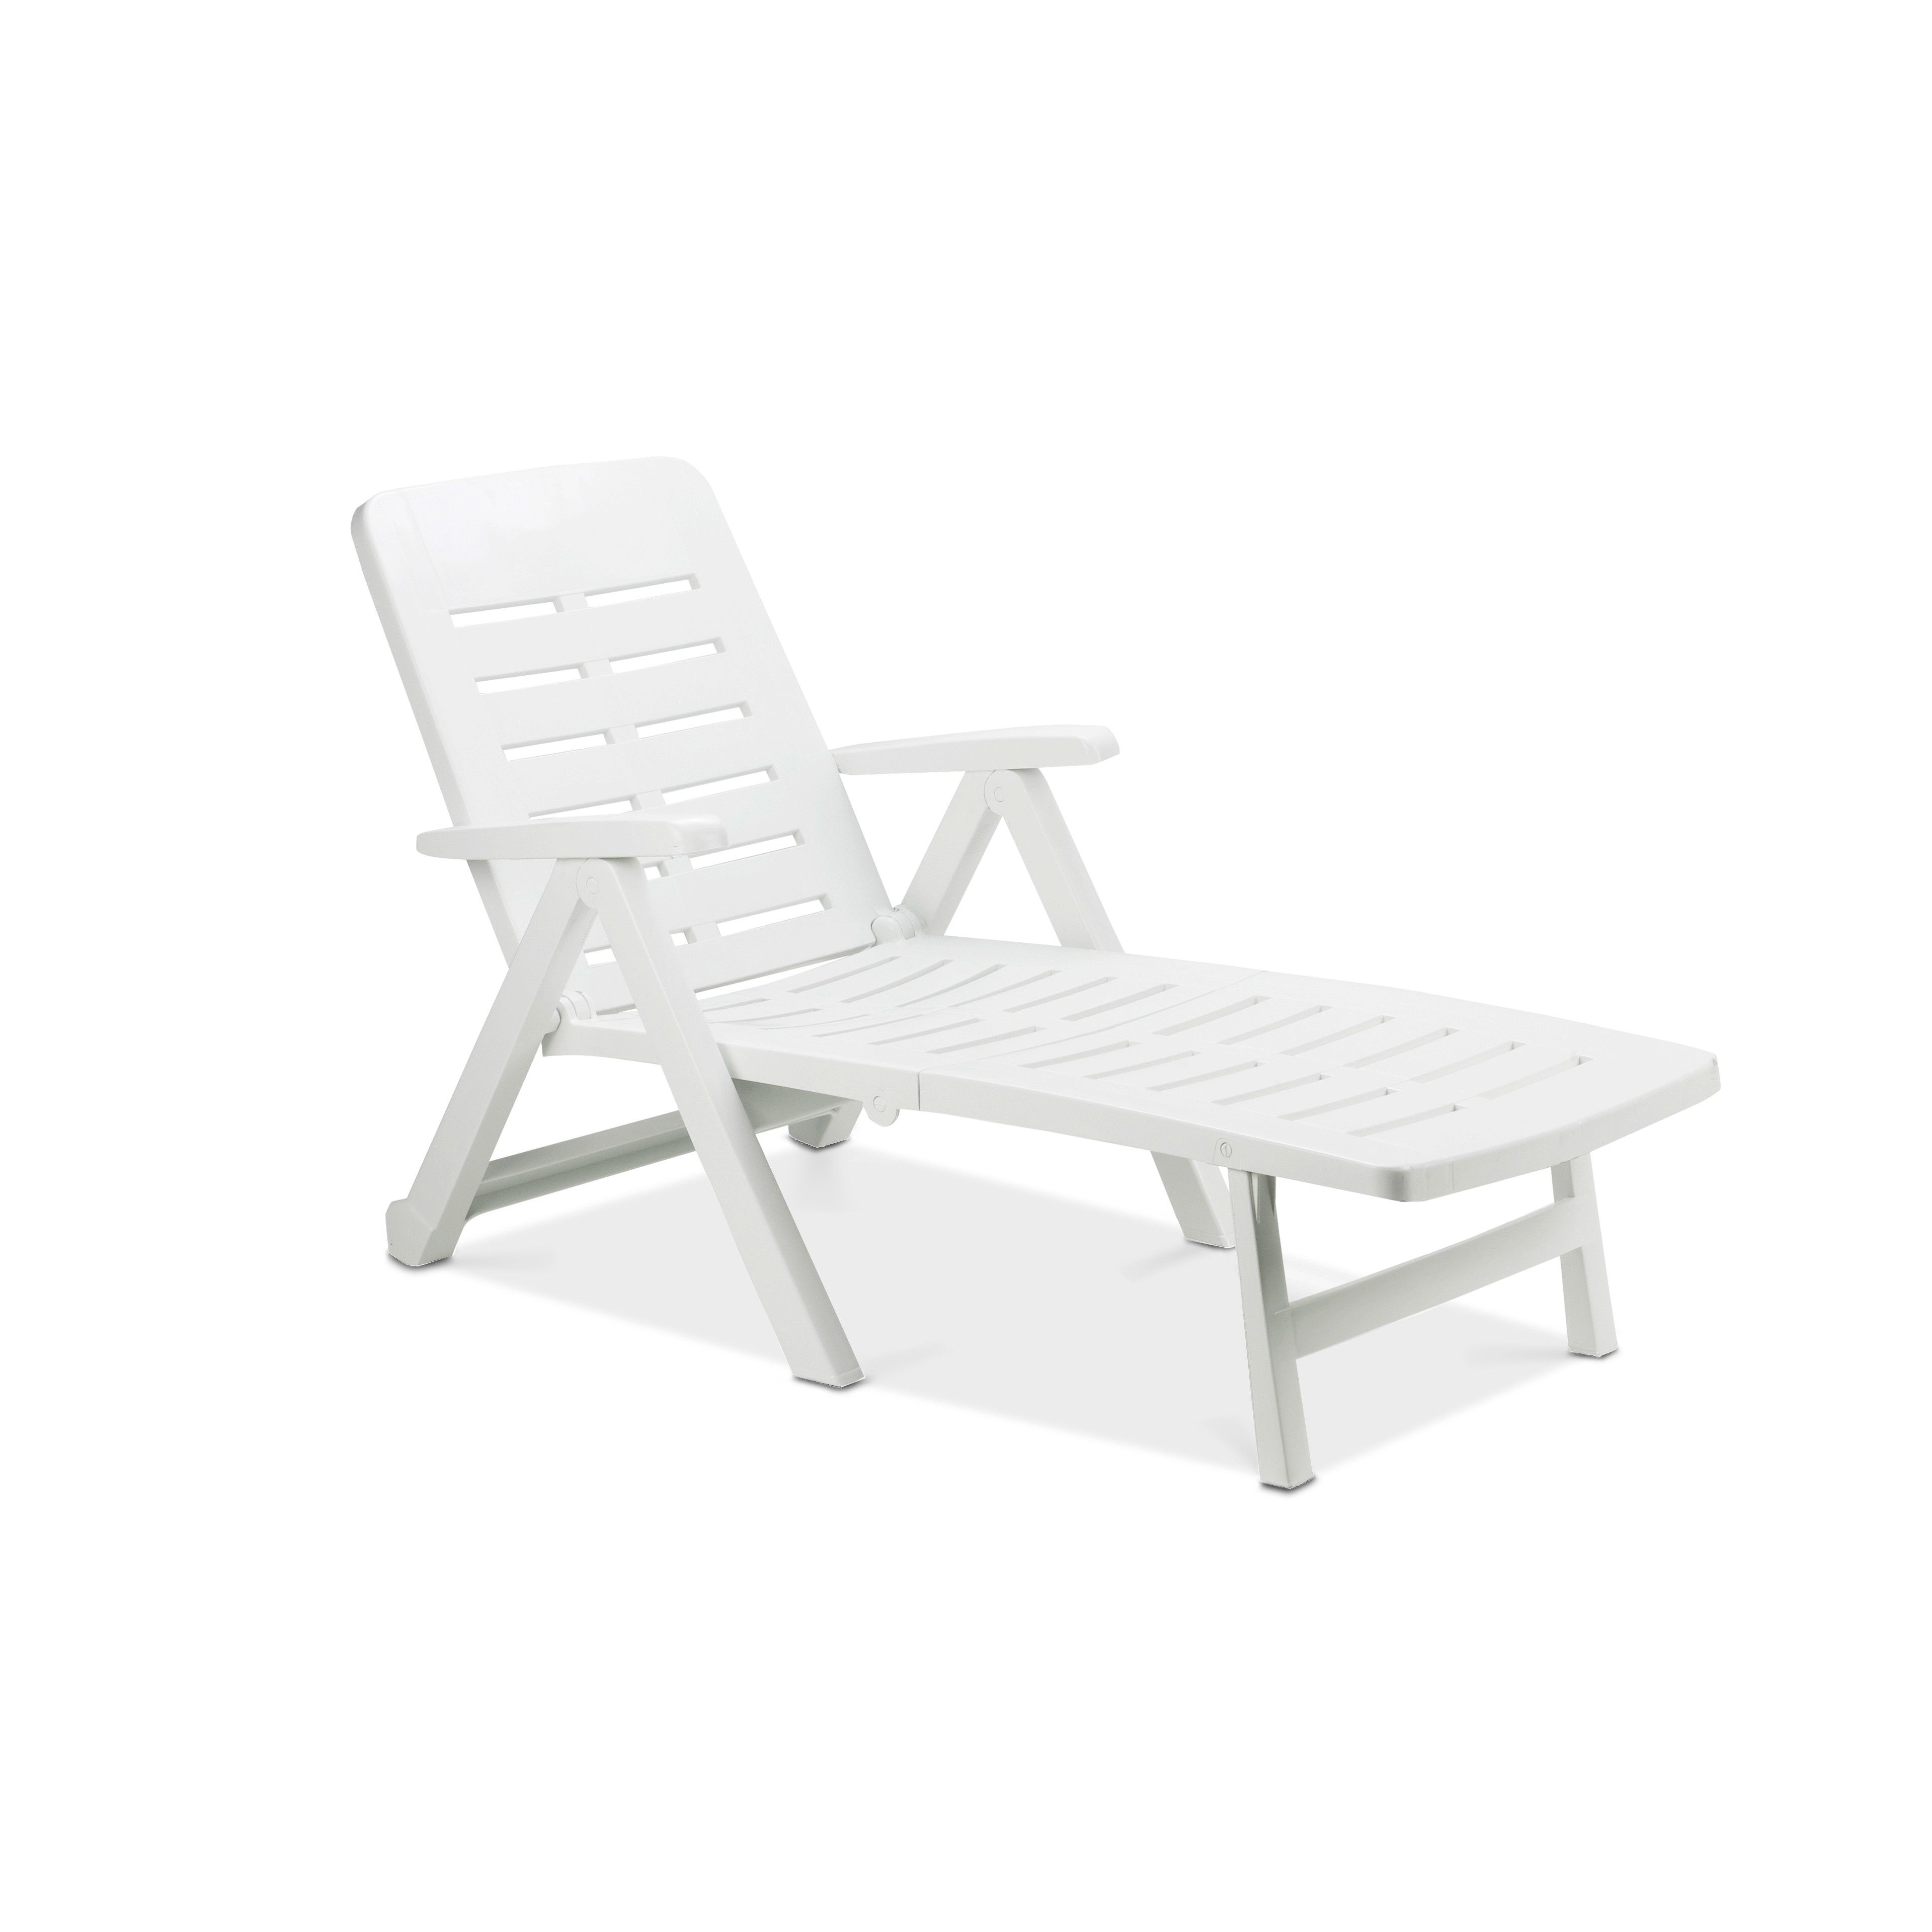 Bain de soleil plastique Chaise Longue Plastique on chaise sofa sleeper, chaise recliner chair, chaise furniture,